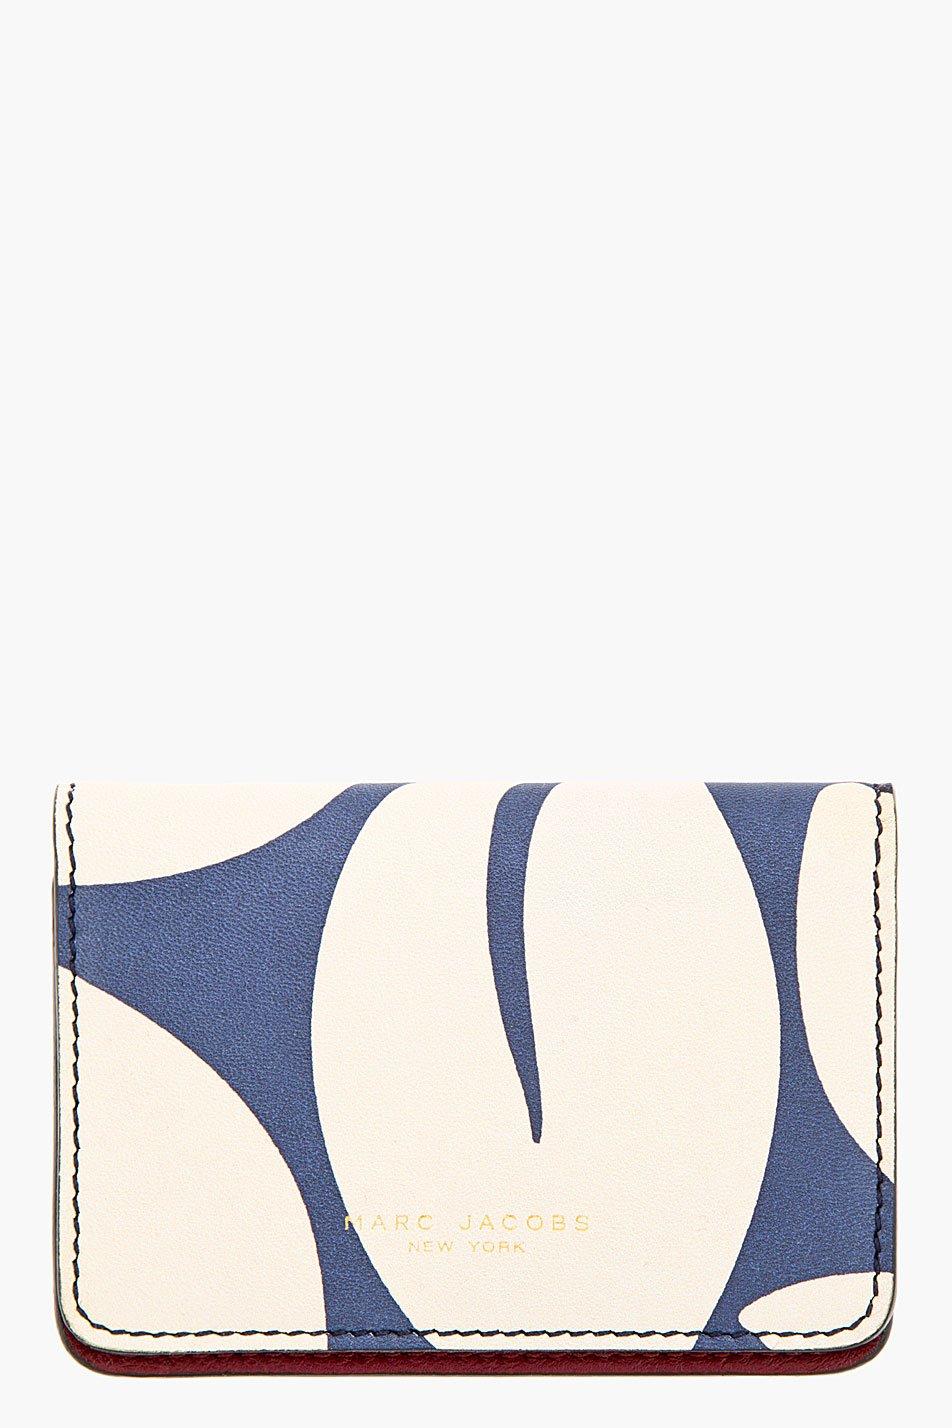 Marc jacobs blue and maroon leaf print wallet